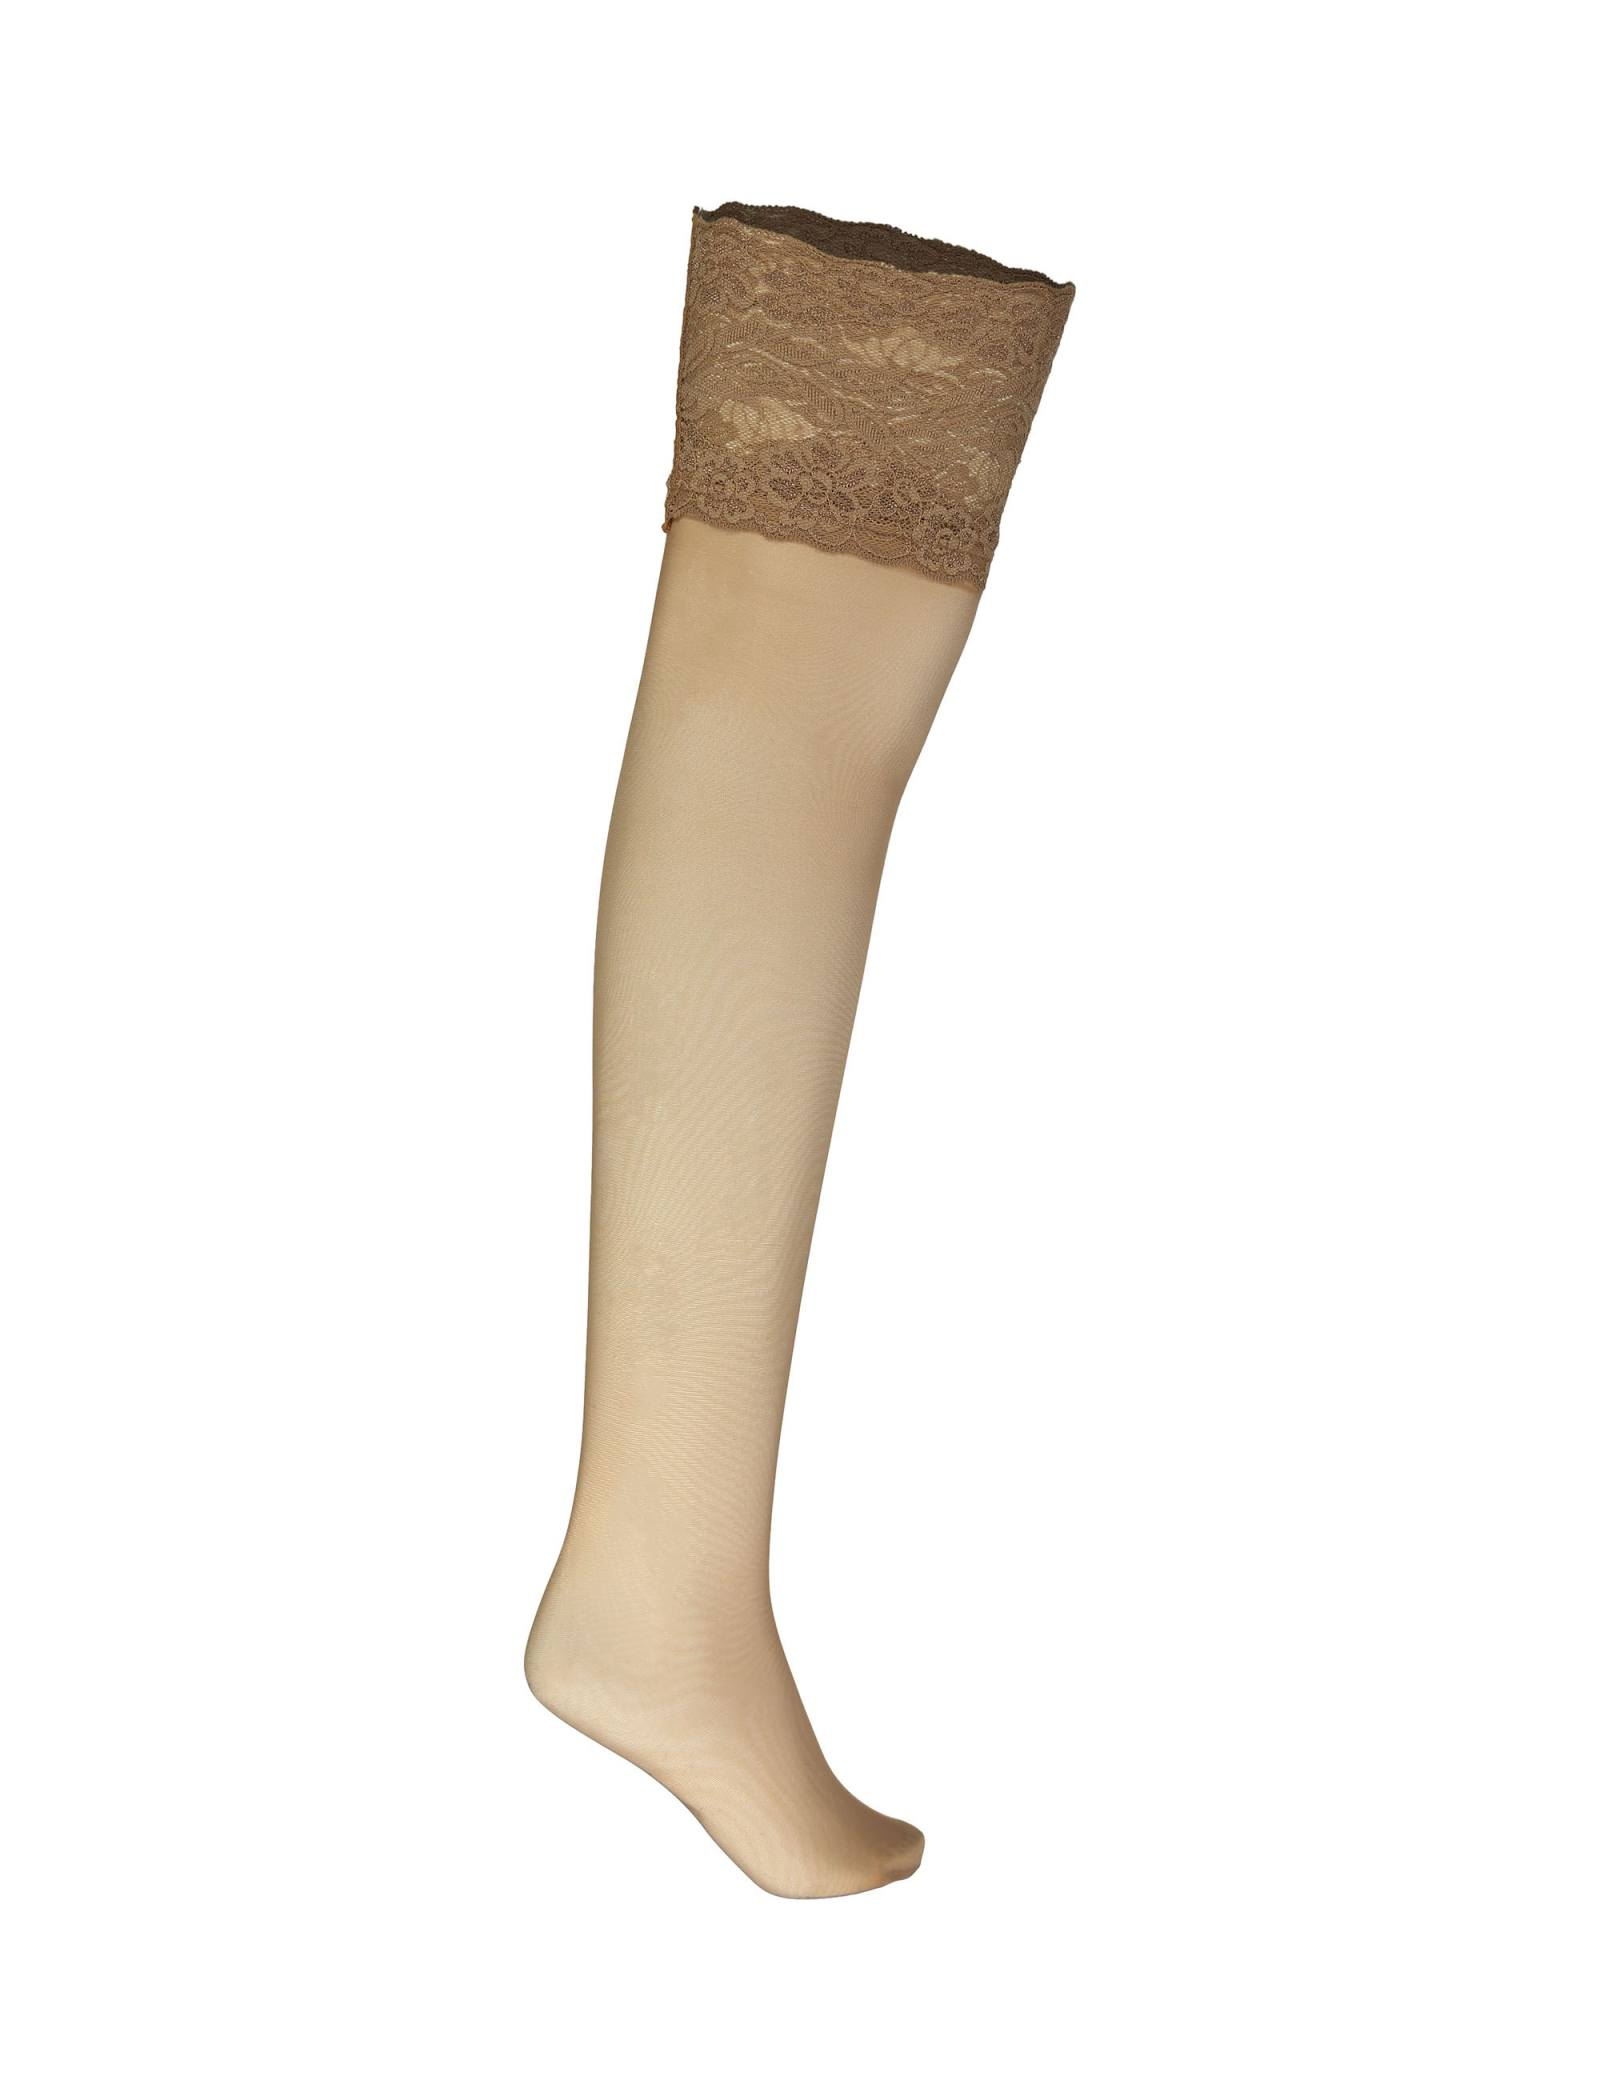 جوراب ساق بلند زنانه - لاوین رز - رنگ پا - 1